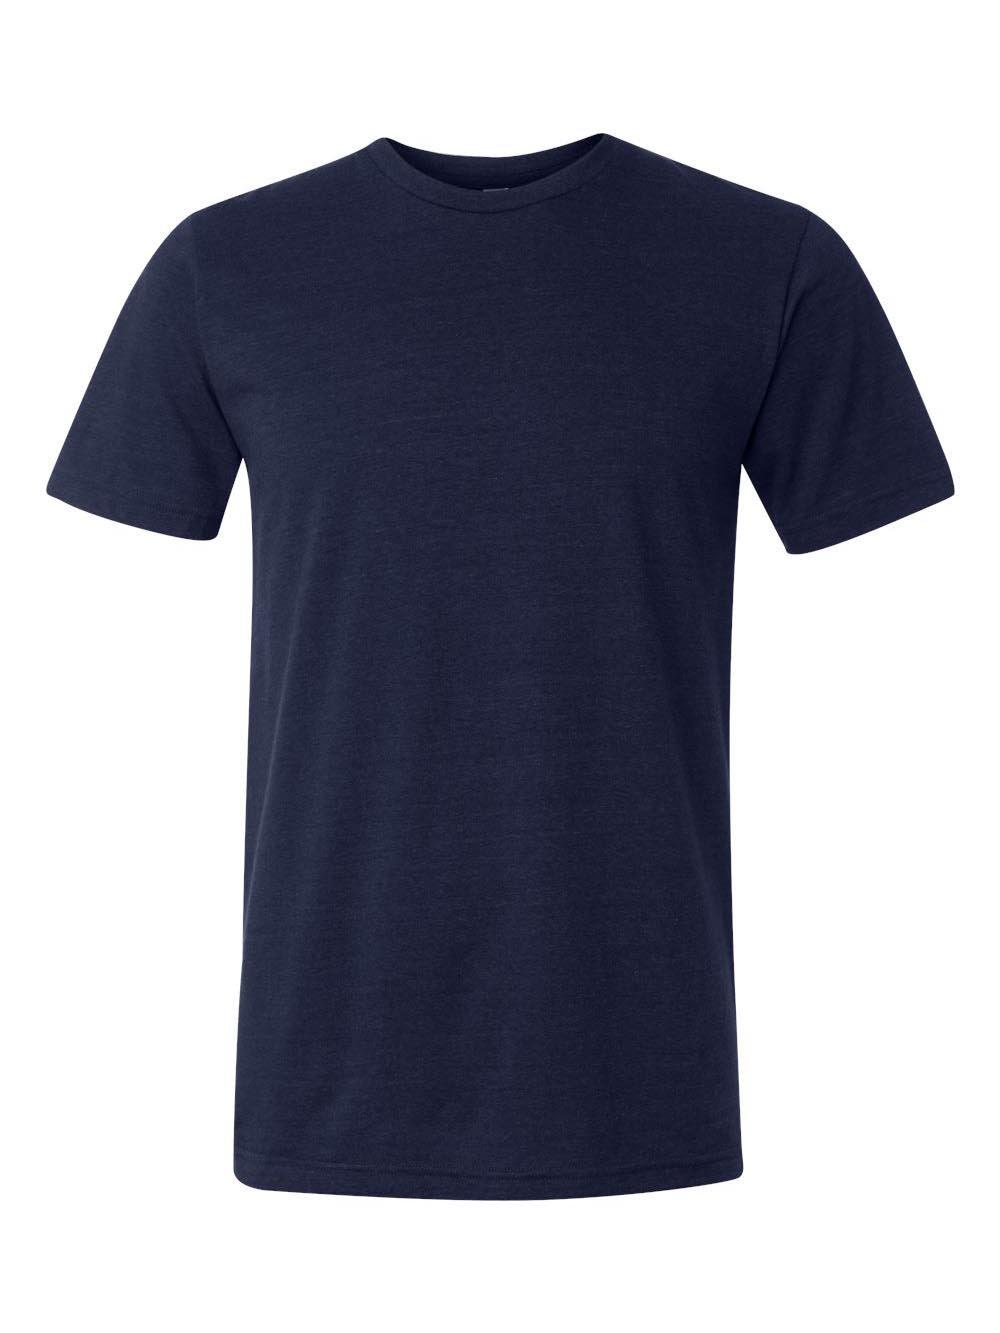 3413 Bella + Canvas Unisex Triblend Short-Sleeve Tee (Navy TriBlend) (3XL)